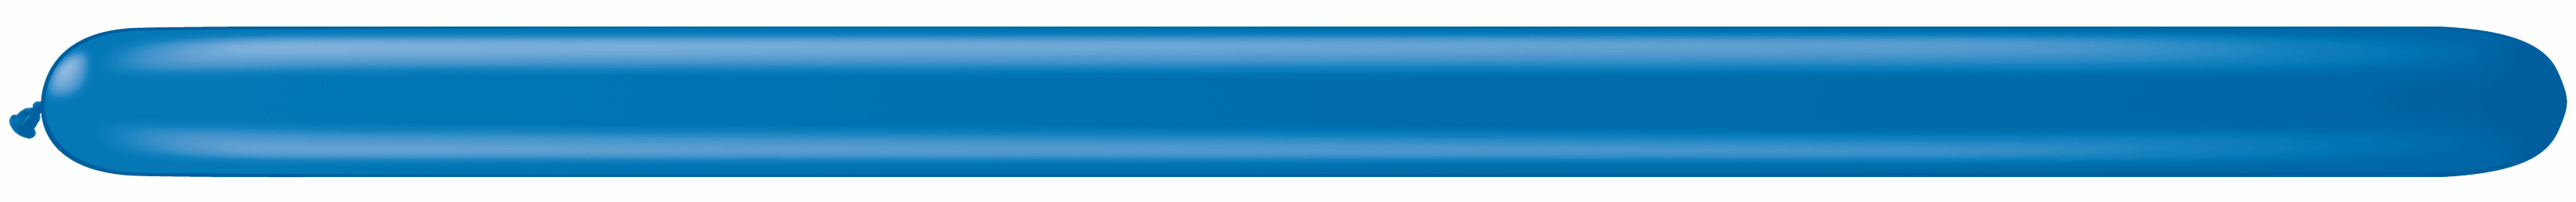 160Q Dark Blue Entertainer Balloons (100 Count)